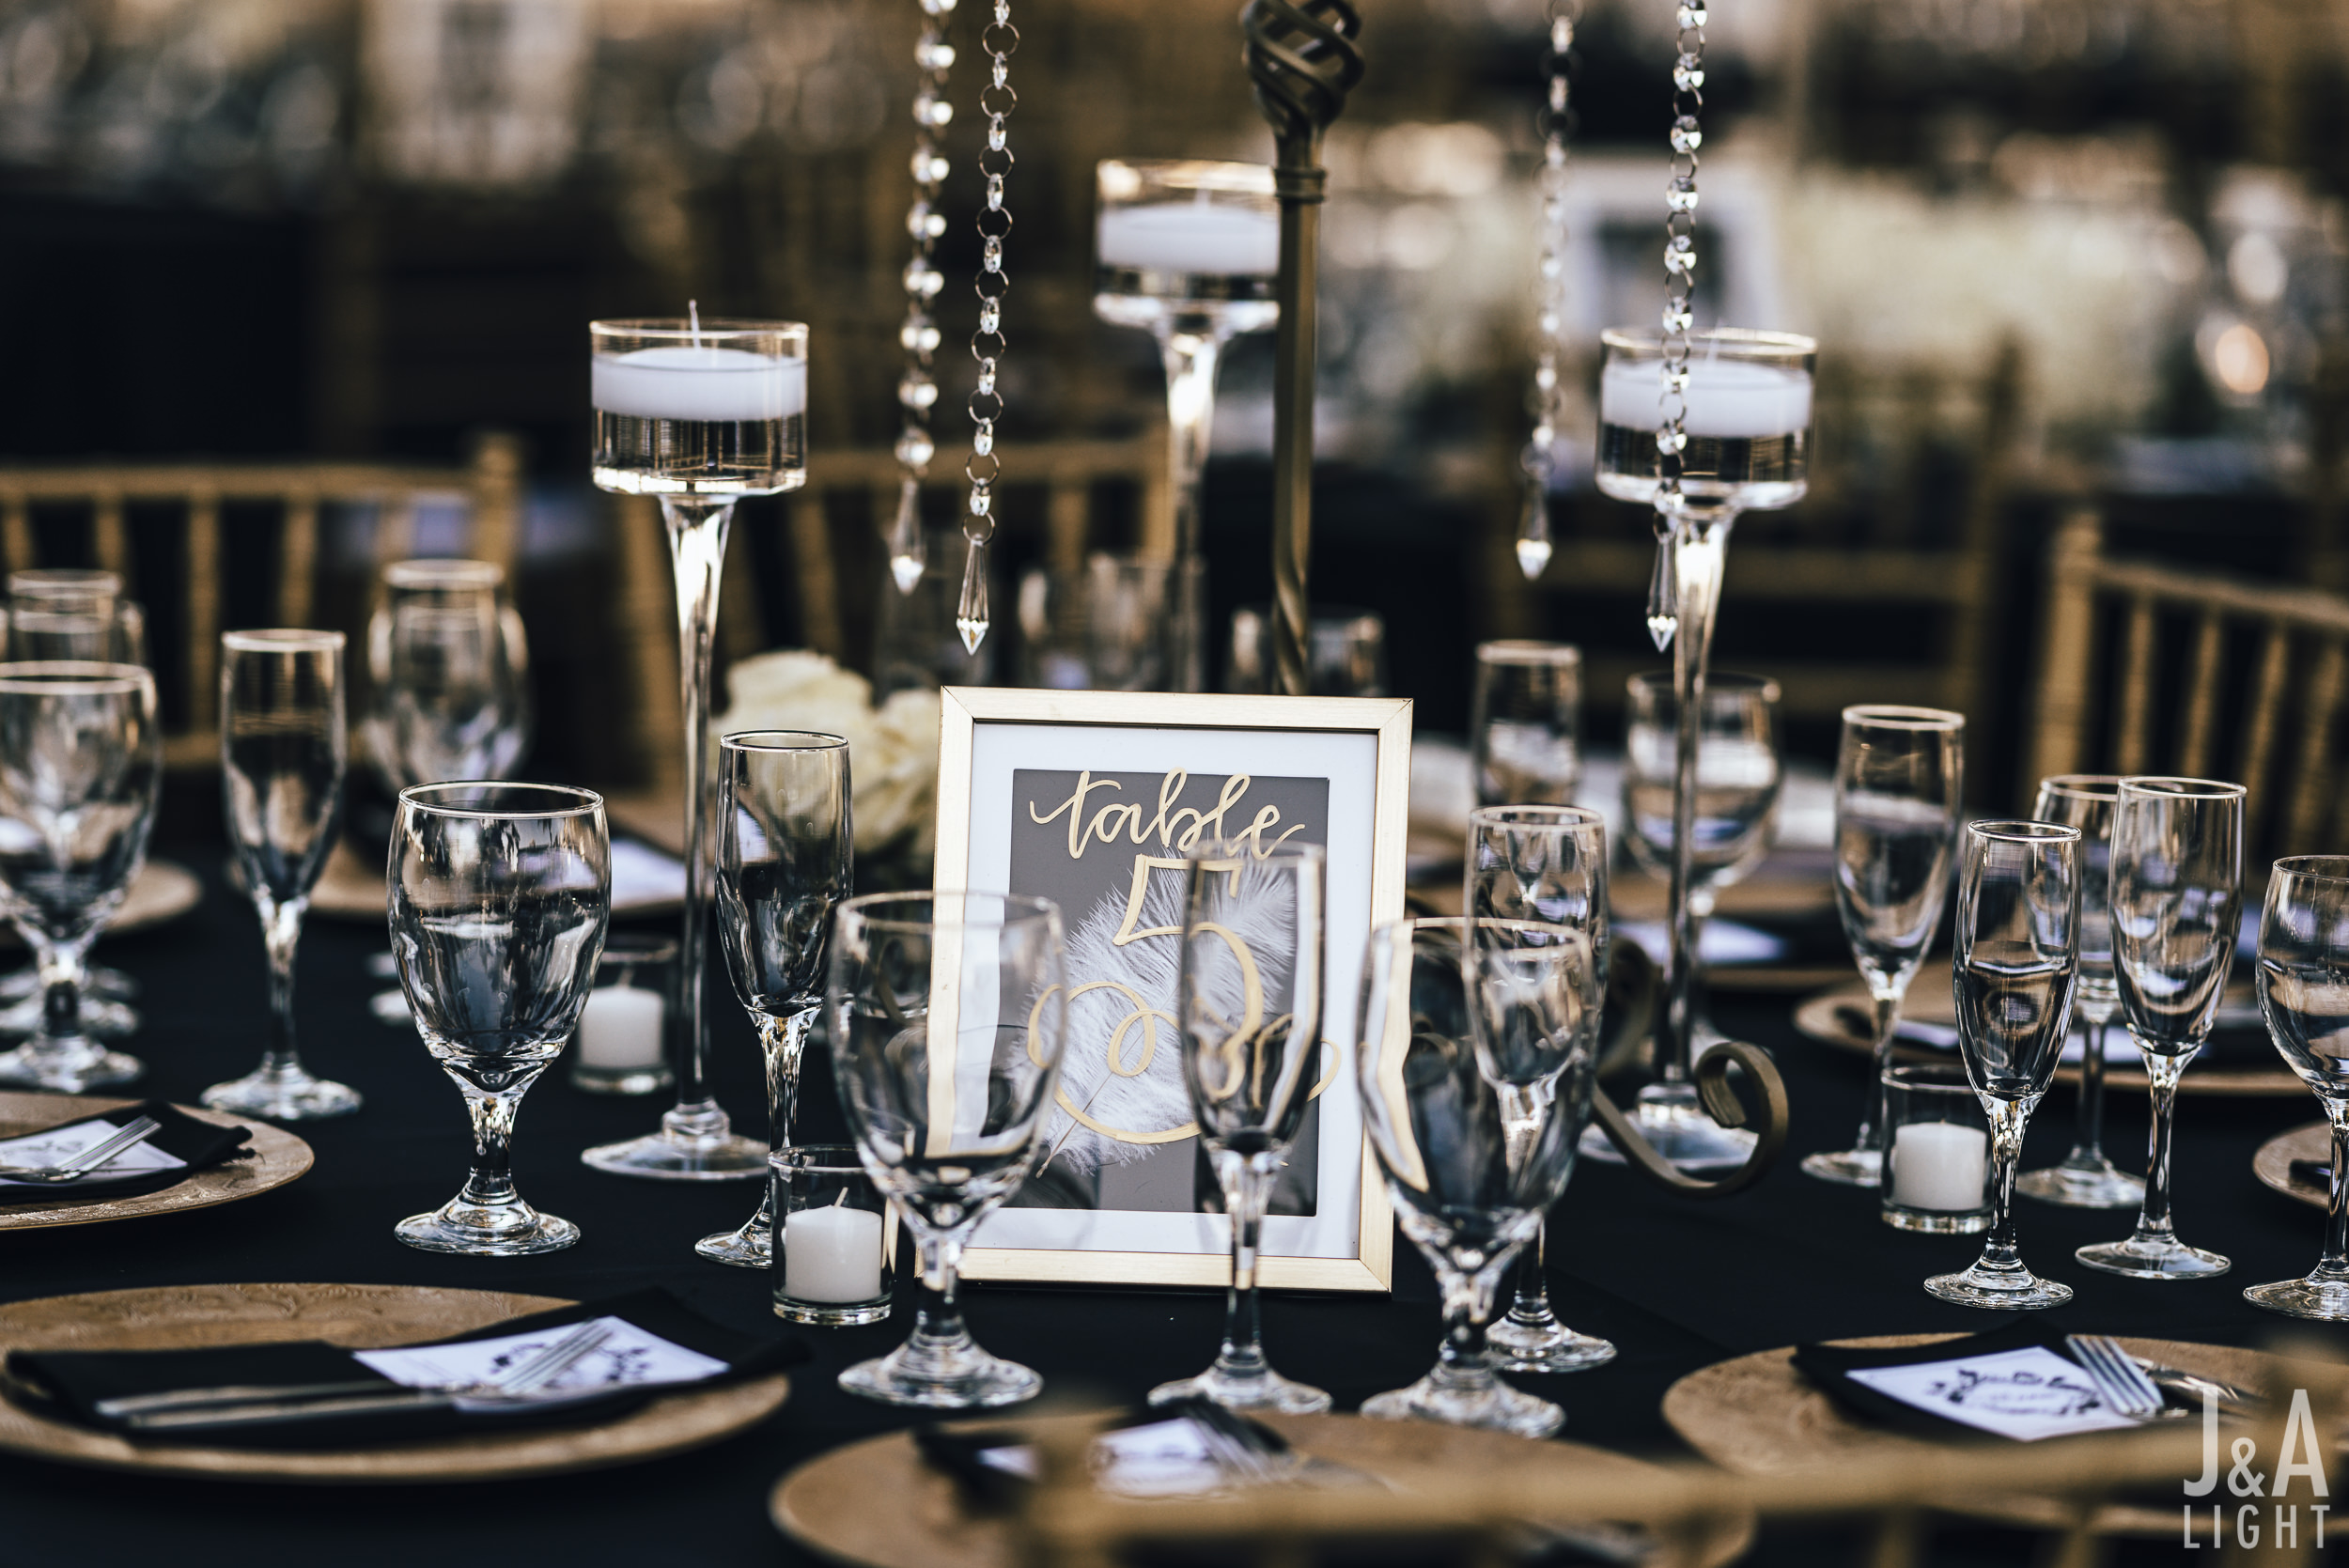 20171014-JanDan-LosBanos-GlassMansion-Wedding-Blog-049.jpg